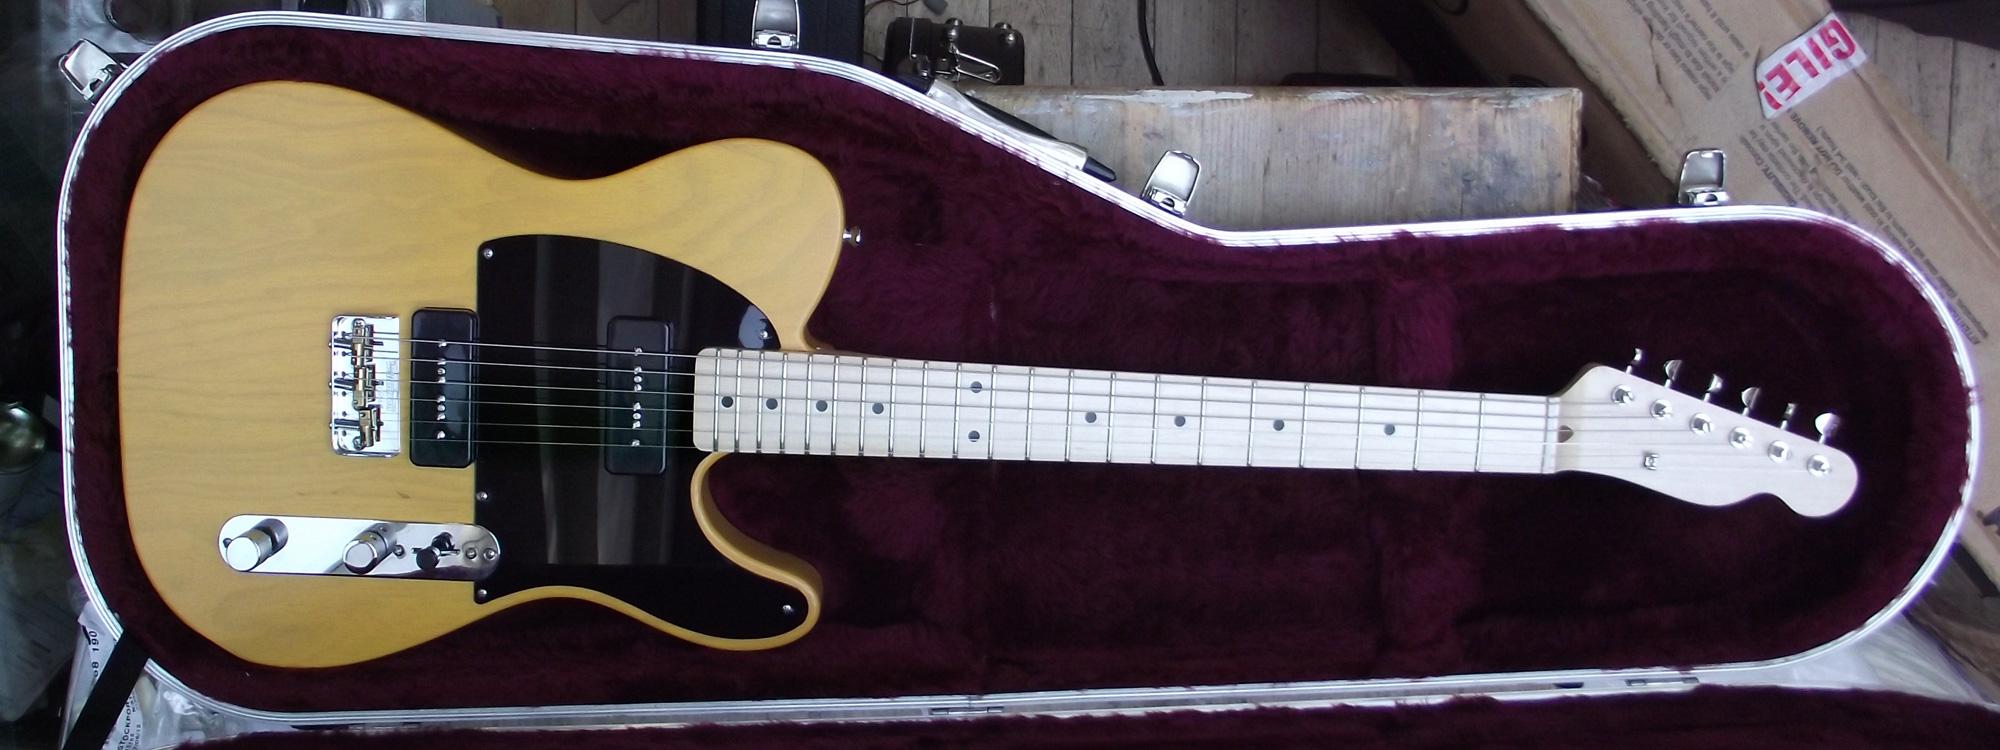 telecaster style guitar with p 90 pickups. Black Bedroom Furniture Sets. Home Design Ideas